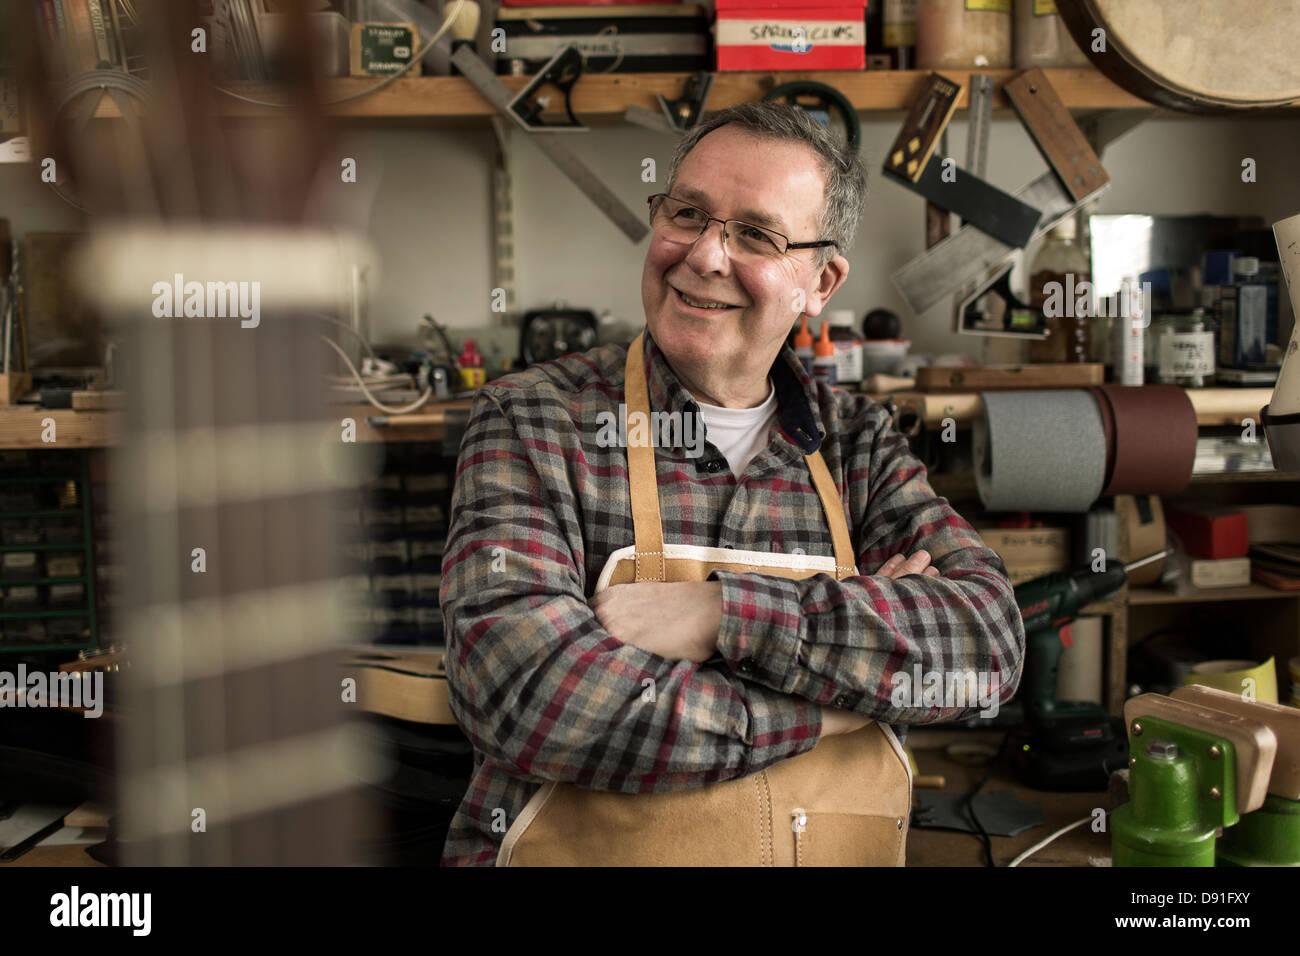 Guitar maker standing in workshop, smiling - Stock Image